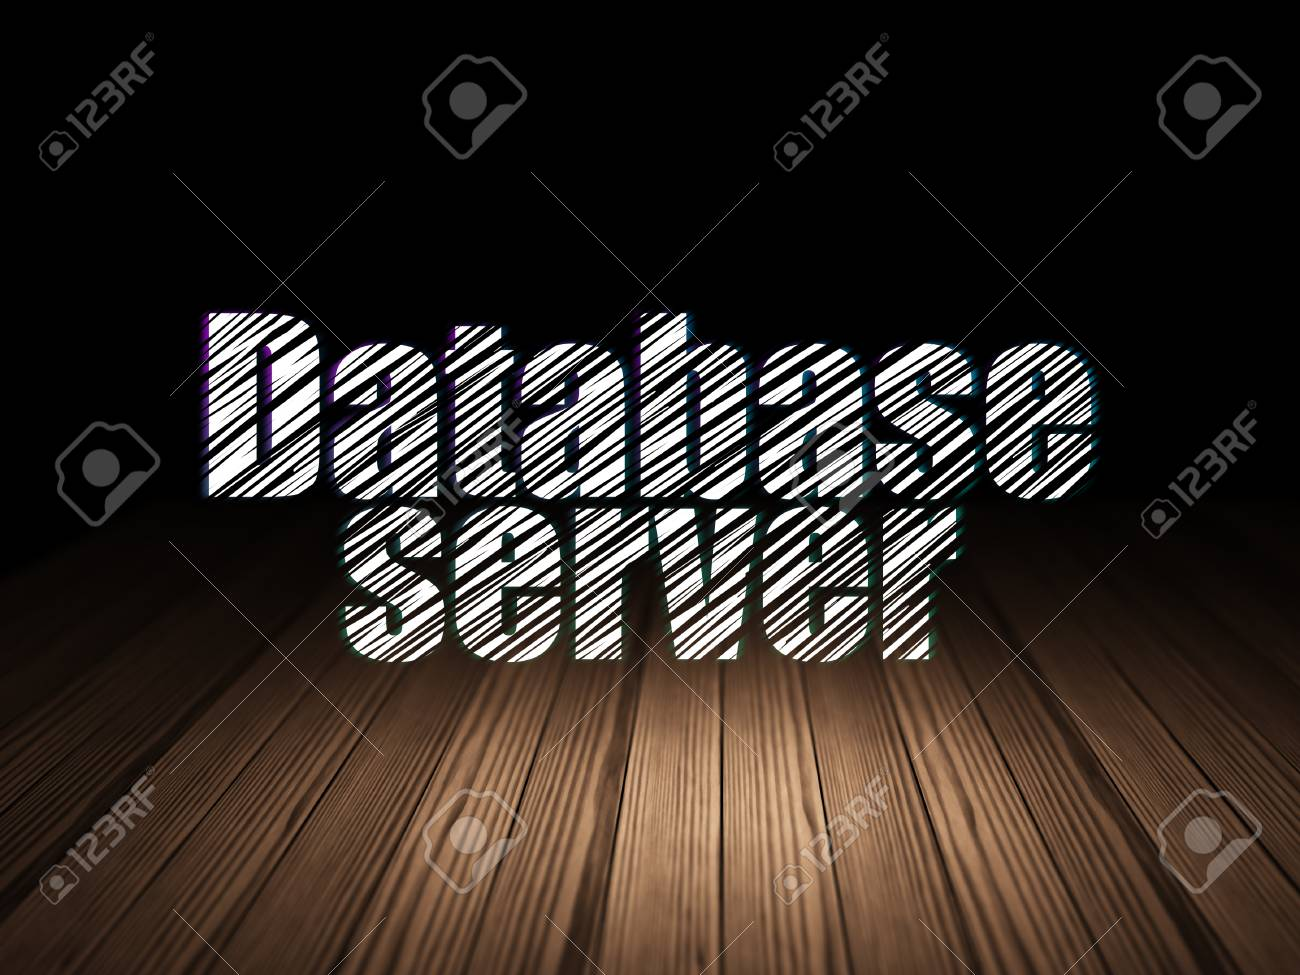 Concepto de programación: servidor de base de datos de texto brillante en  el cuarto oscuro de grunge con piso de madera, fondo negro